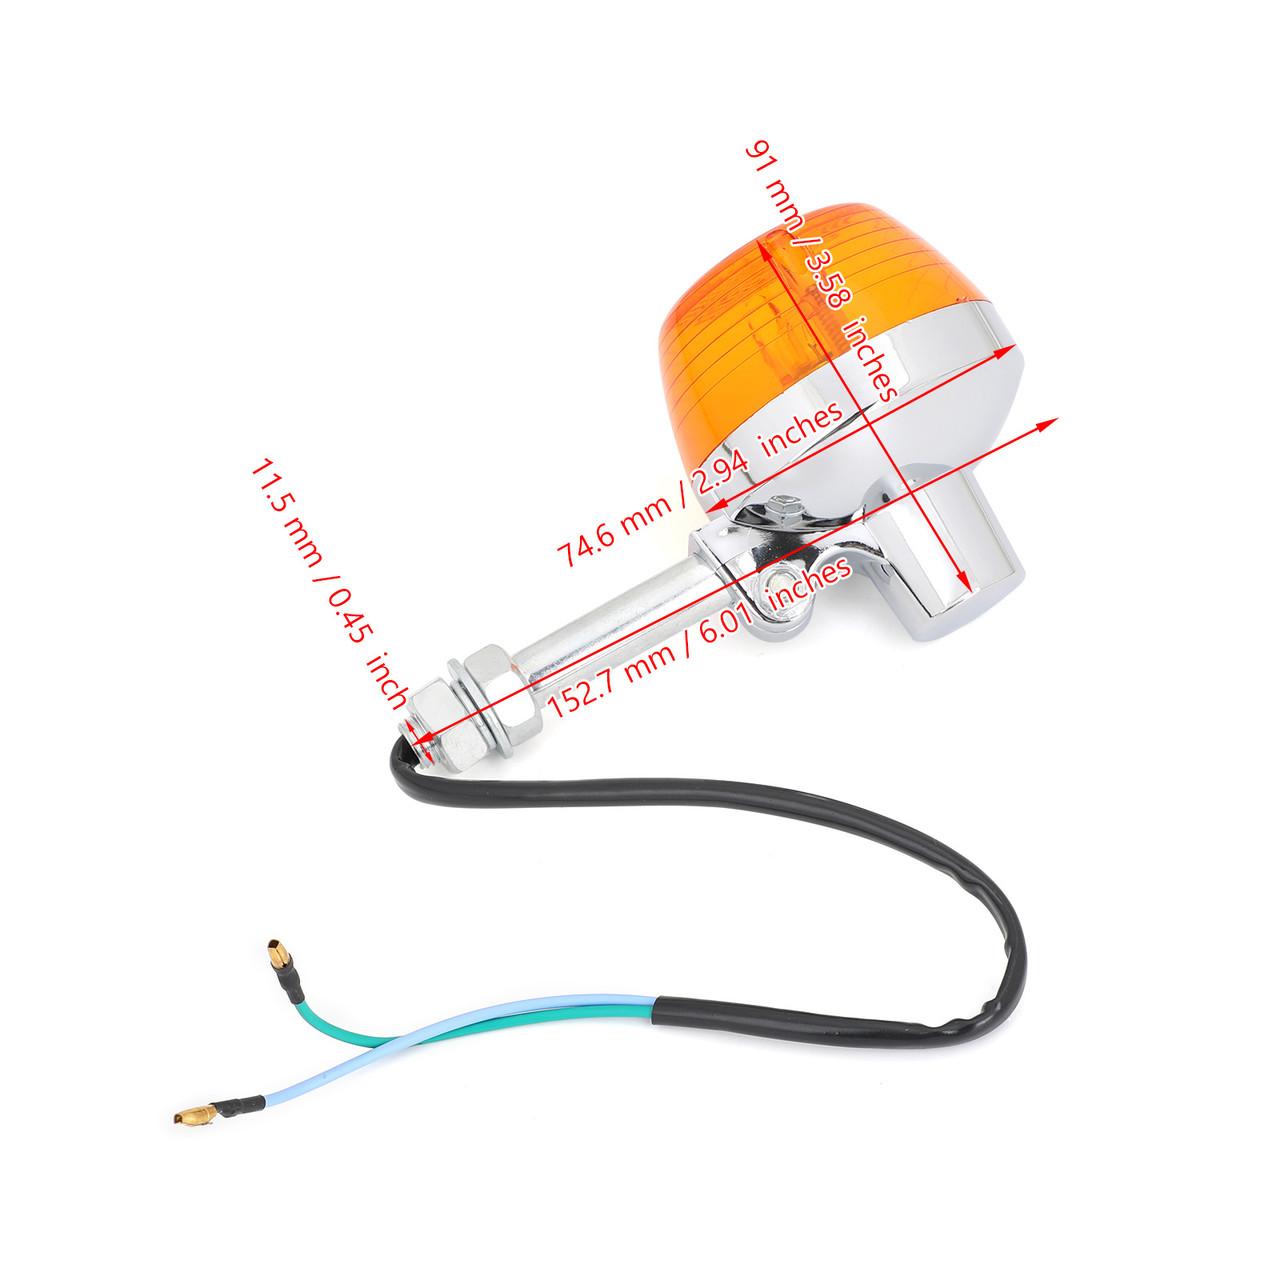 2x Turn Signal Light 12V For Honda CT70 CT90 XL100 CB350 CM400 CB450 CB750